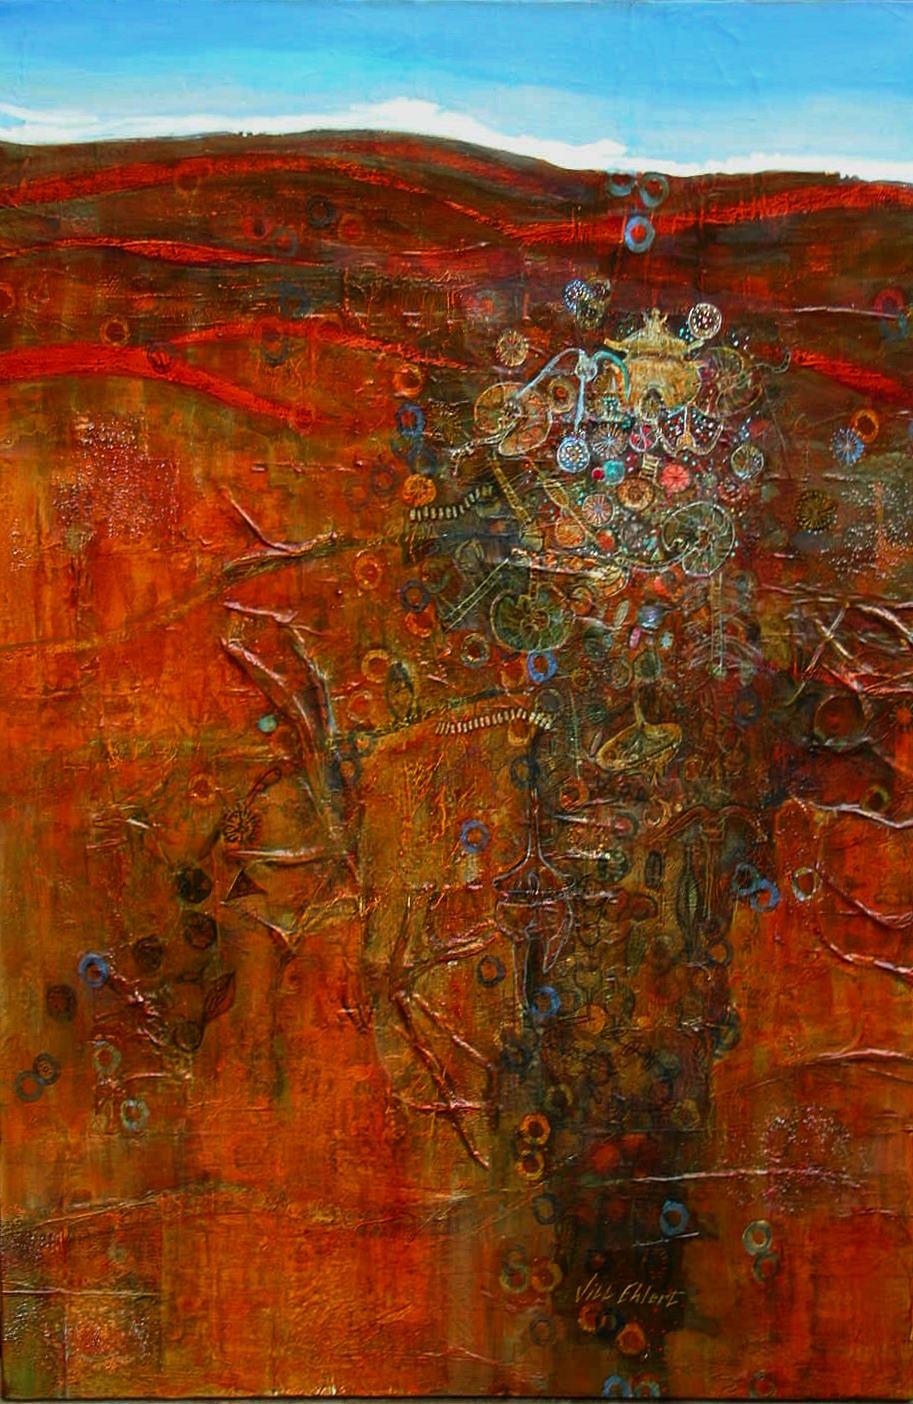 """THE BIG WORLD OF SMALL"" -  Jill Ehlert  © 24"" X 36"" Acrylic, mixed media on canvas"